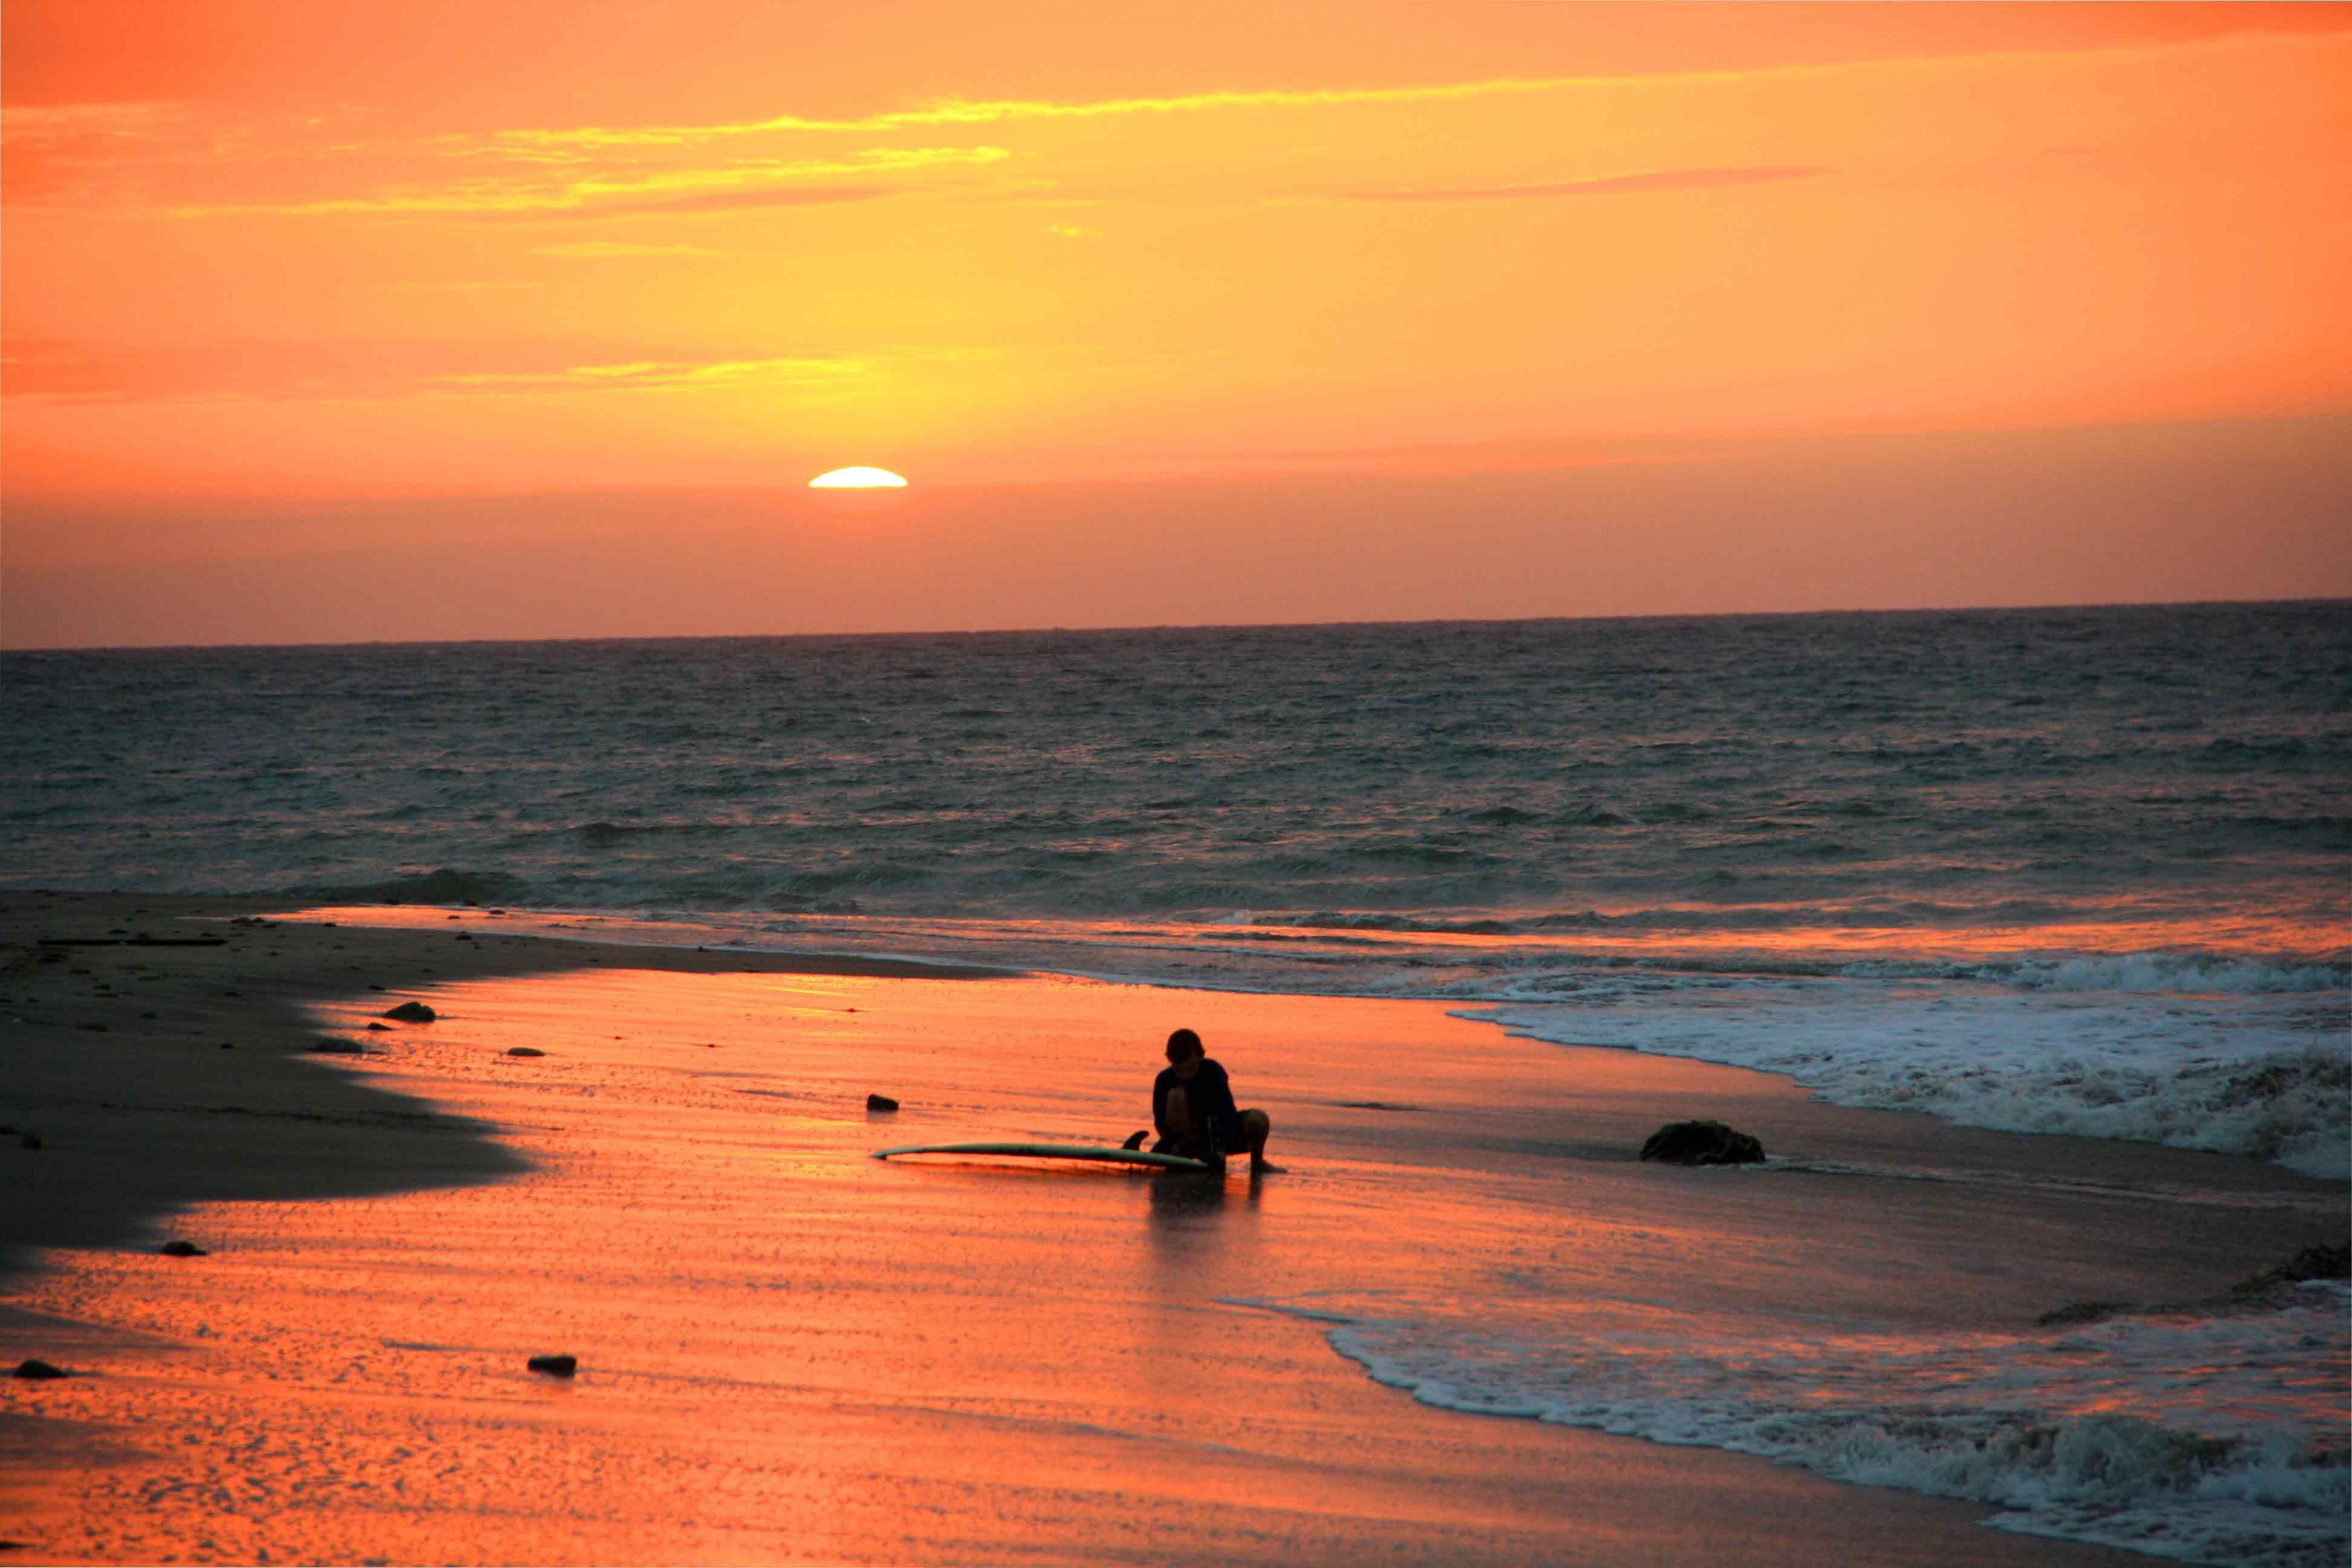 sunset surf session mancora peru 3a89f5fee50